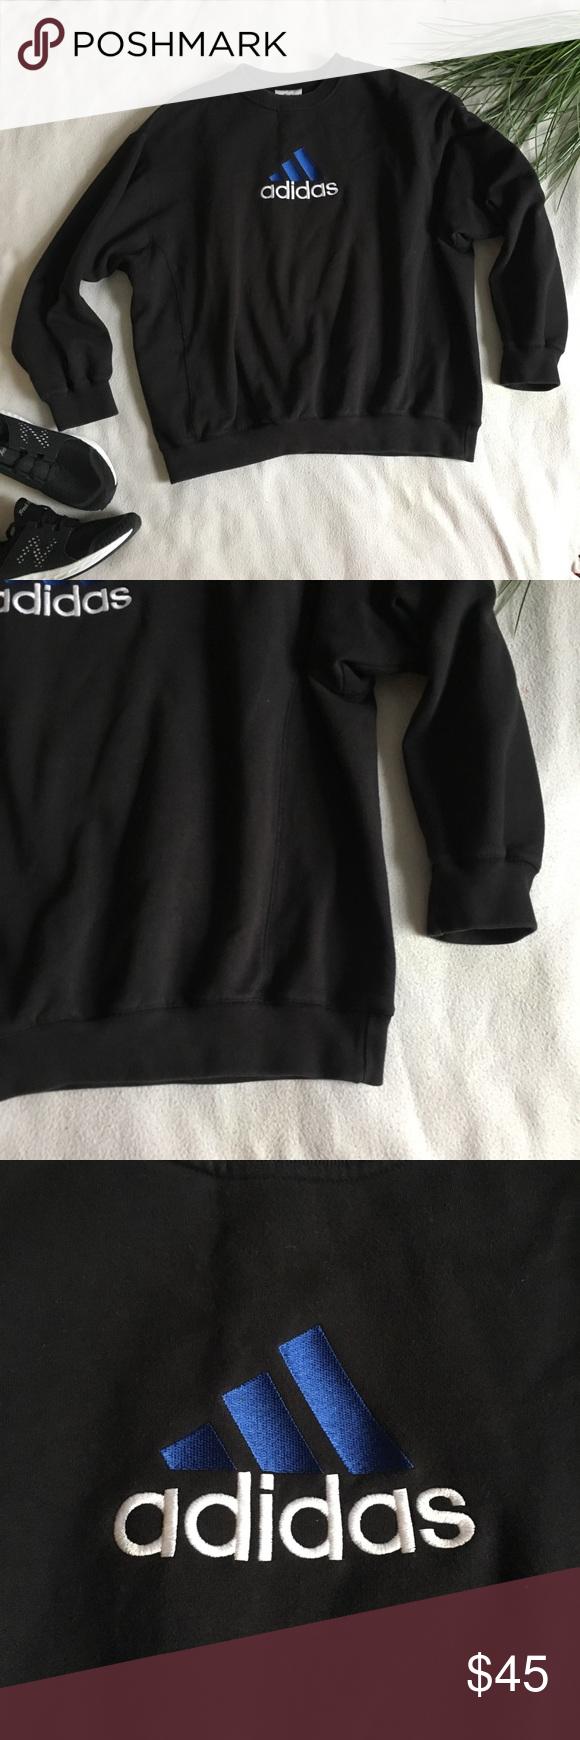 Vintage Adidas Logo Unisex Crew Neck Sweatshirt Sweatshirt Makeover Trendy Sweatshirt Sweatshirts [ 1740 x 580 Pixel ]